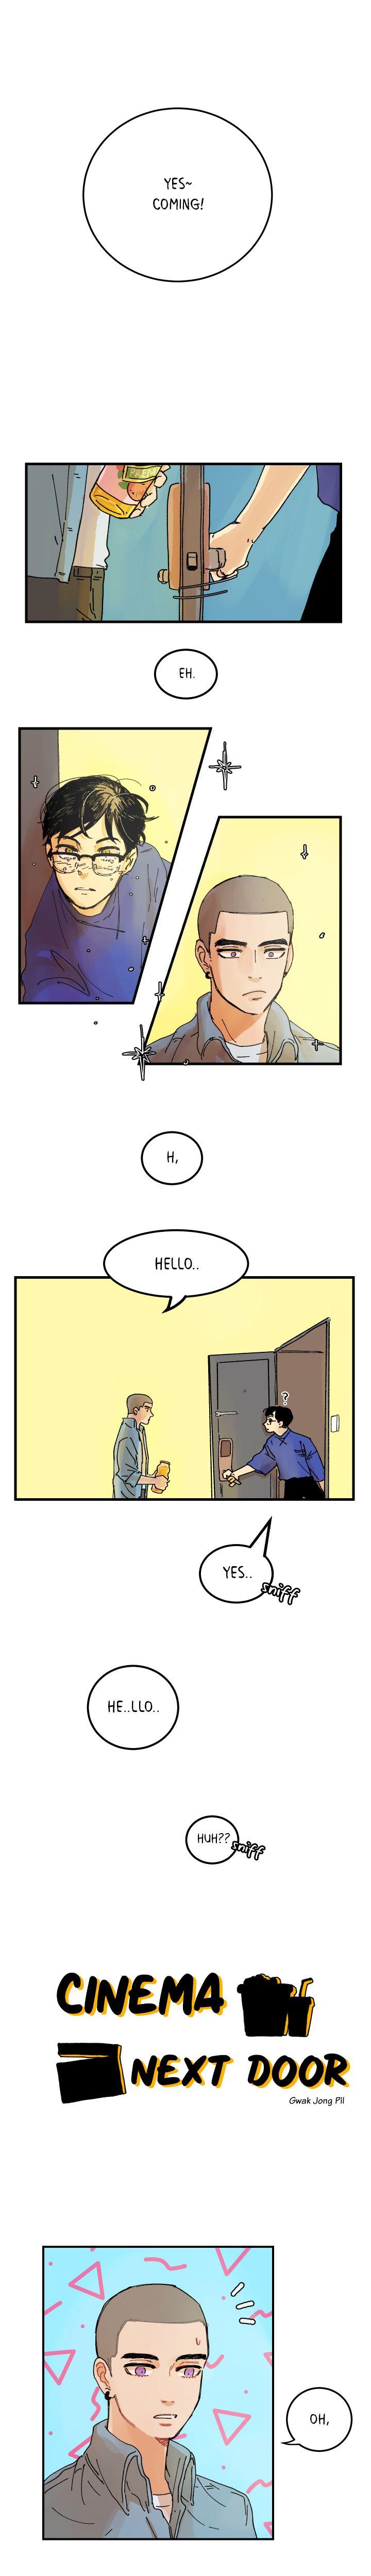 https://img2.nineanime.com/comics/pic1/25/26329/581920/CinemaNextDoor20813.jpg Page 1